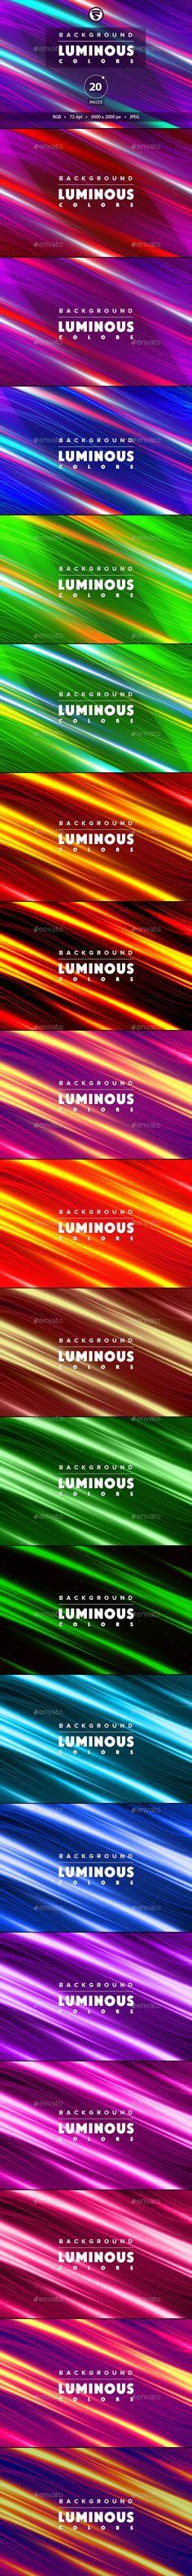 Background luminous colors 20 pieces by Desst 20 Backgrounds abstract luminous colors. Fly luminous colors backgrounds. 20 pieces in set. Jpeg 30002000px. Palette RGB. Thank!